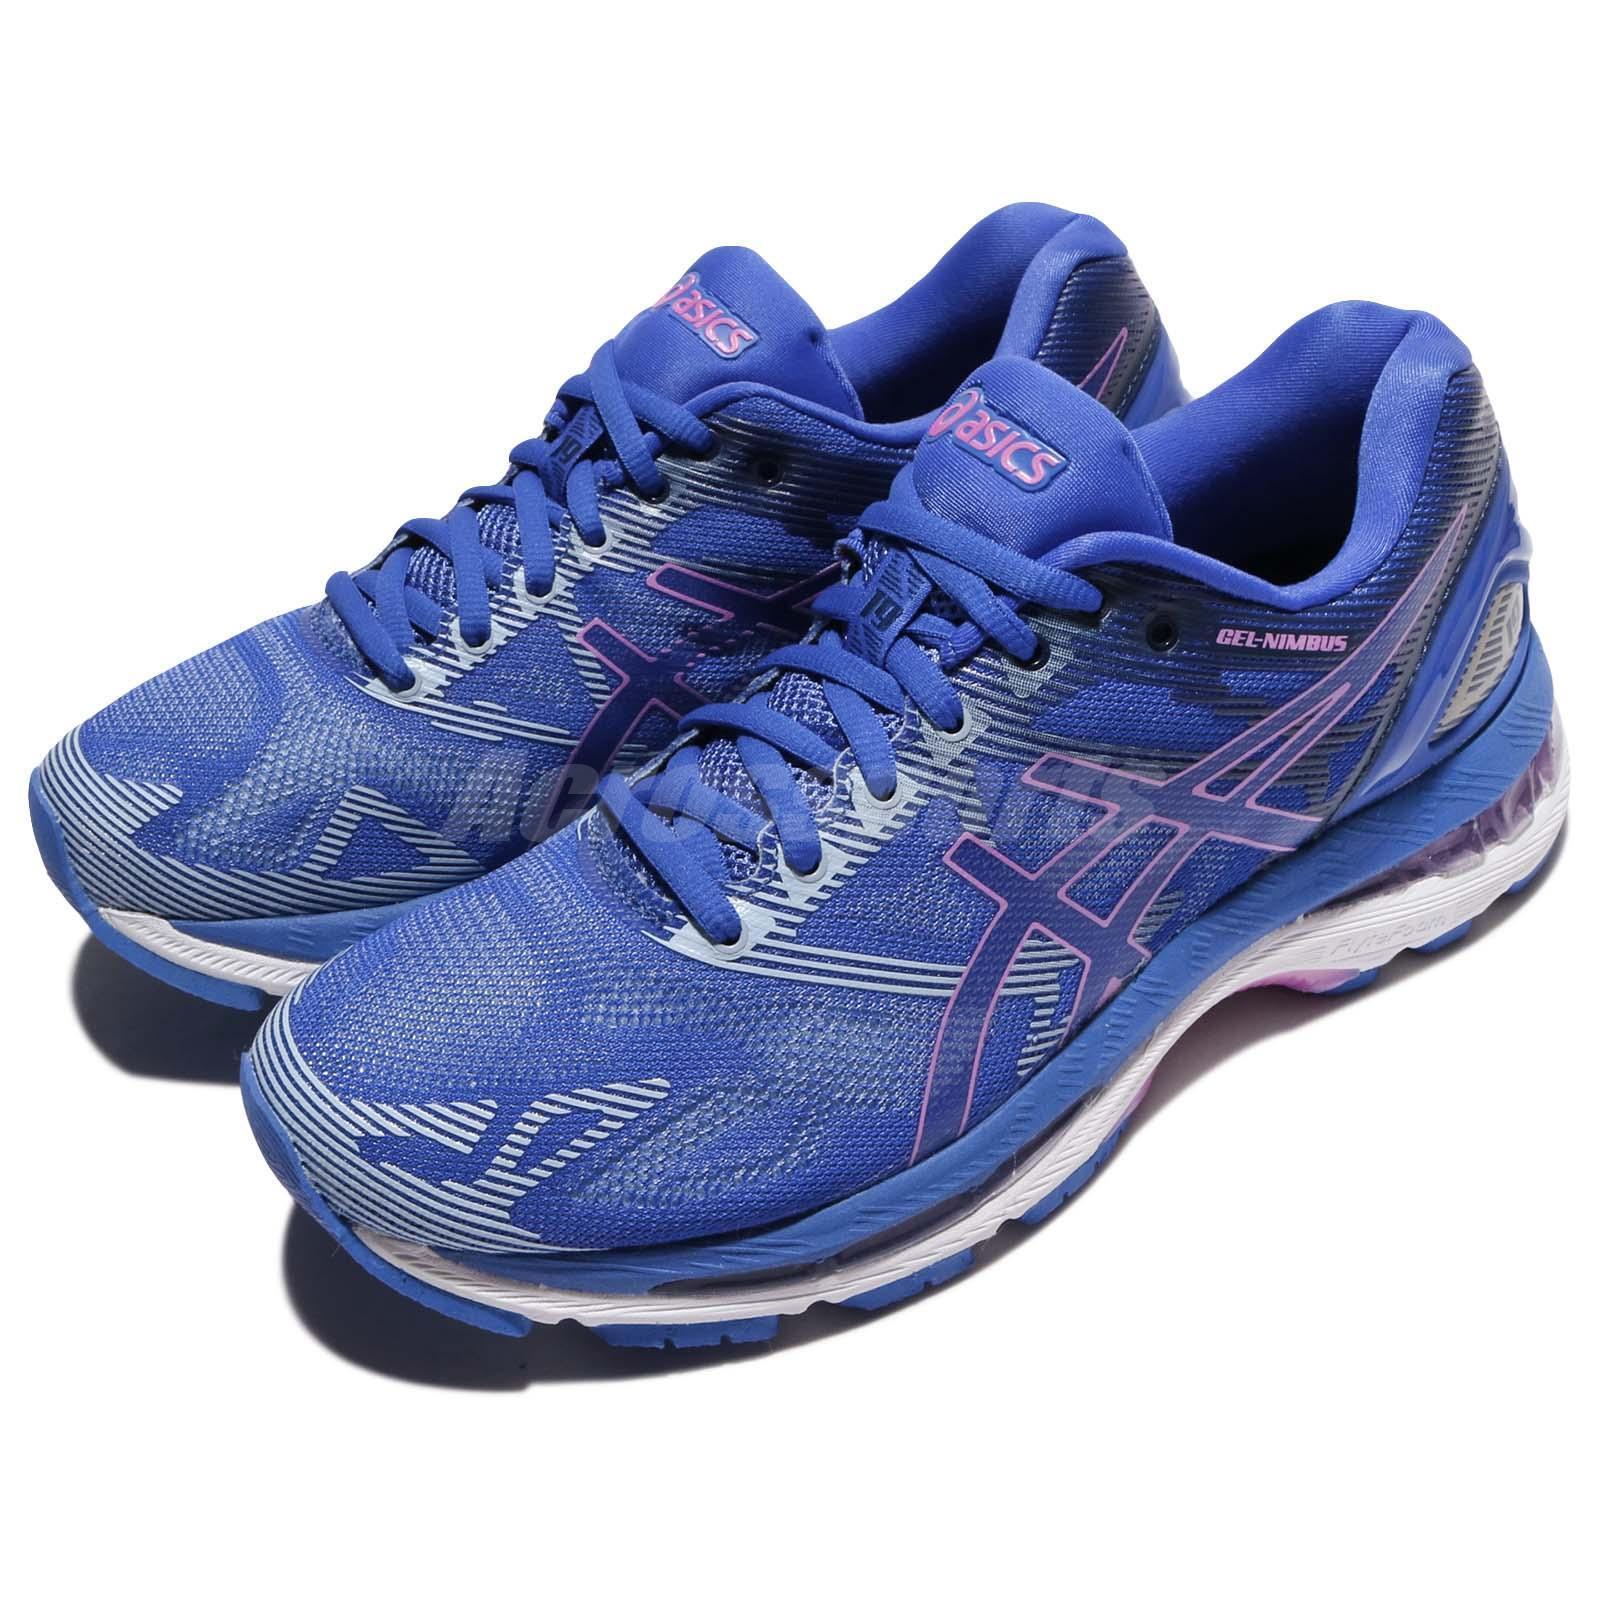 Asics Gel-Nimbus 19 blueee Purple purple Women Running shoes Sneakers T750N-4832